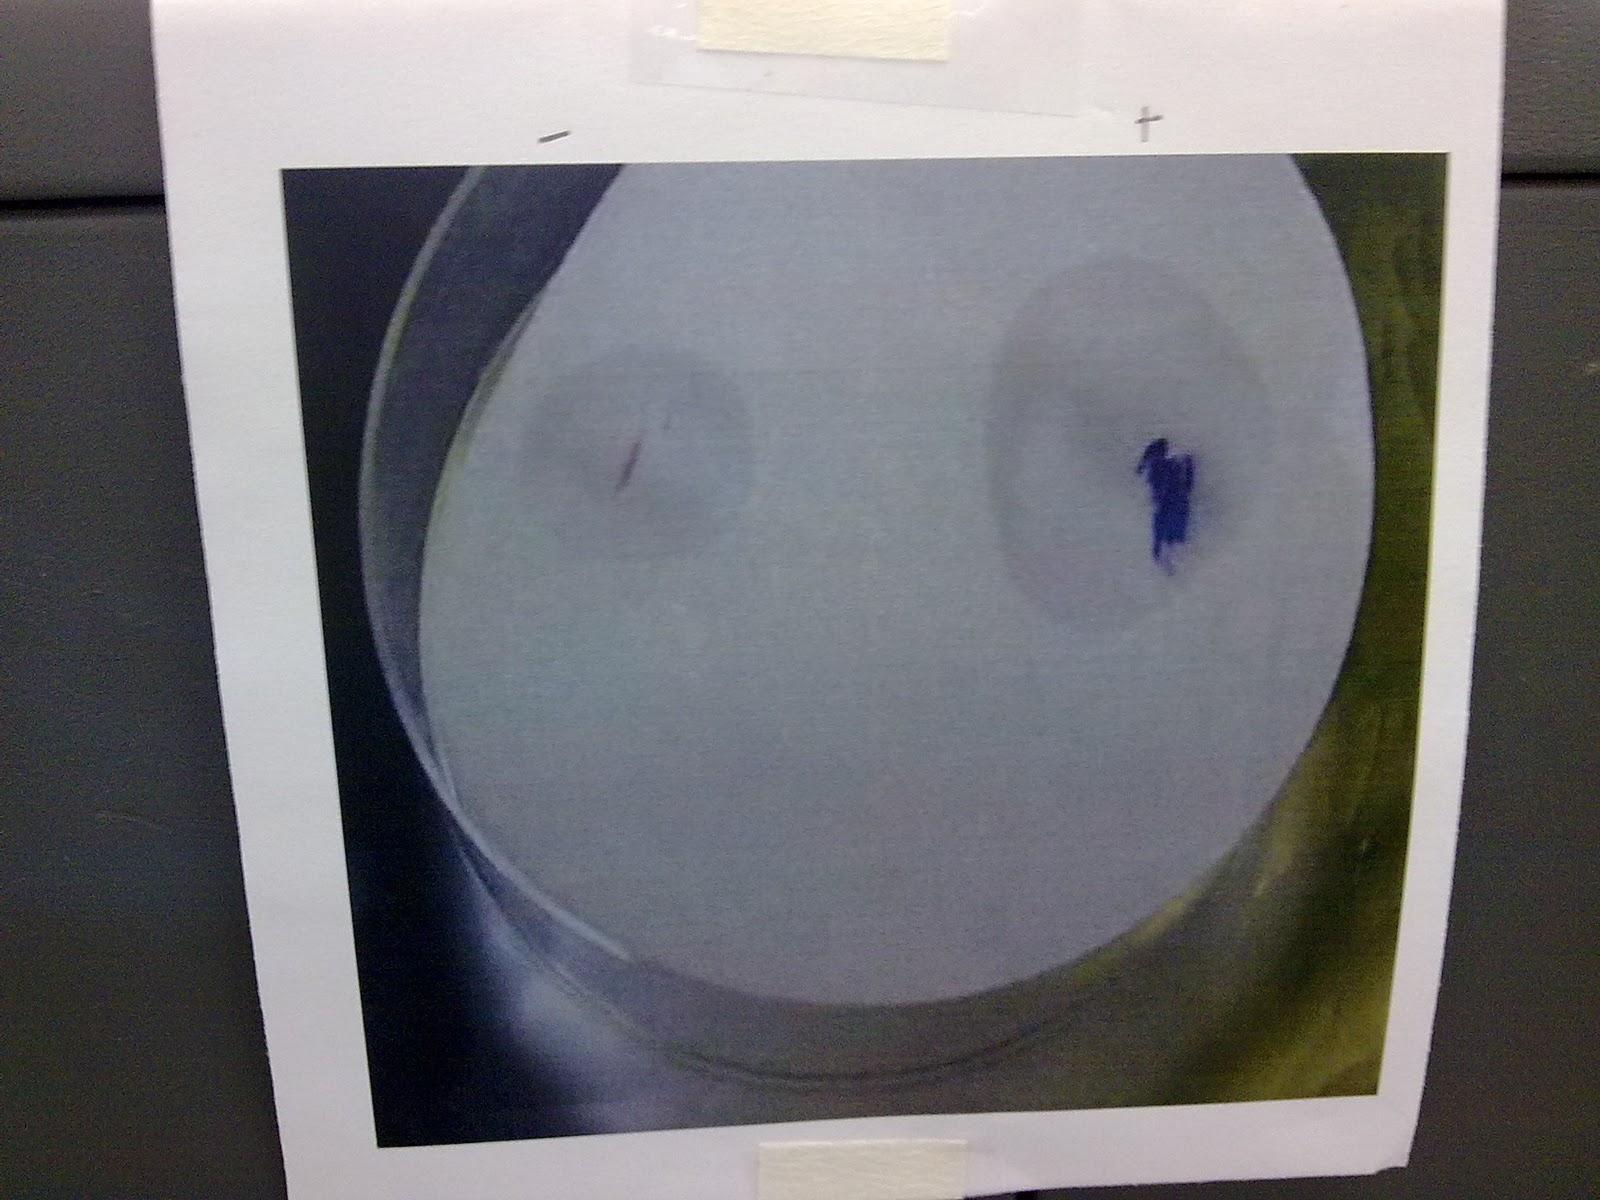 Harpactirinae Biotechnology  Microbes Theoretical Result